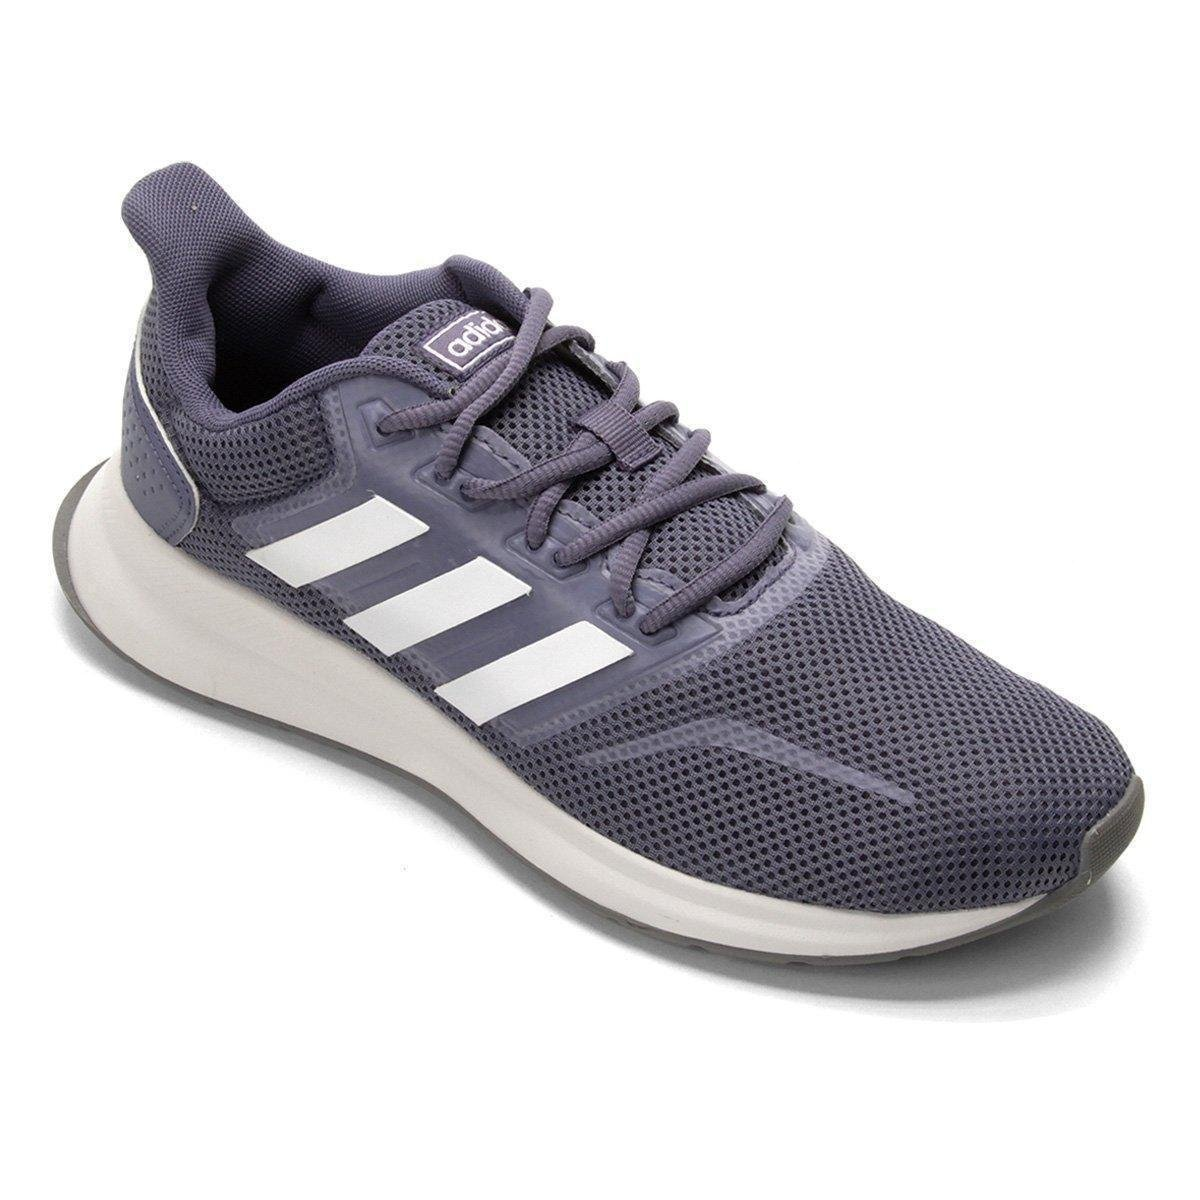 077e25e0b2 Tênis Adidas Falcon Feminino - Cinza - Compre Agora